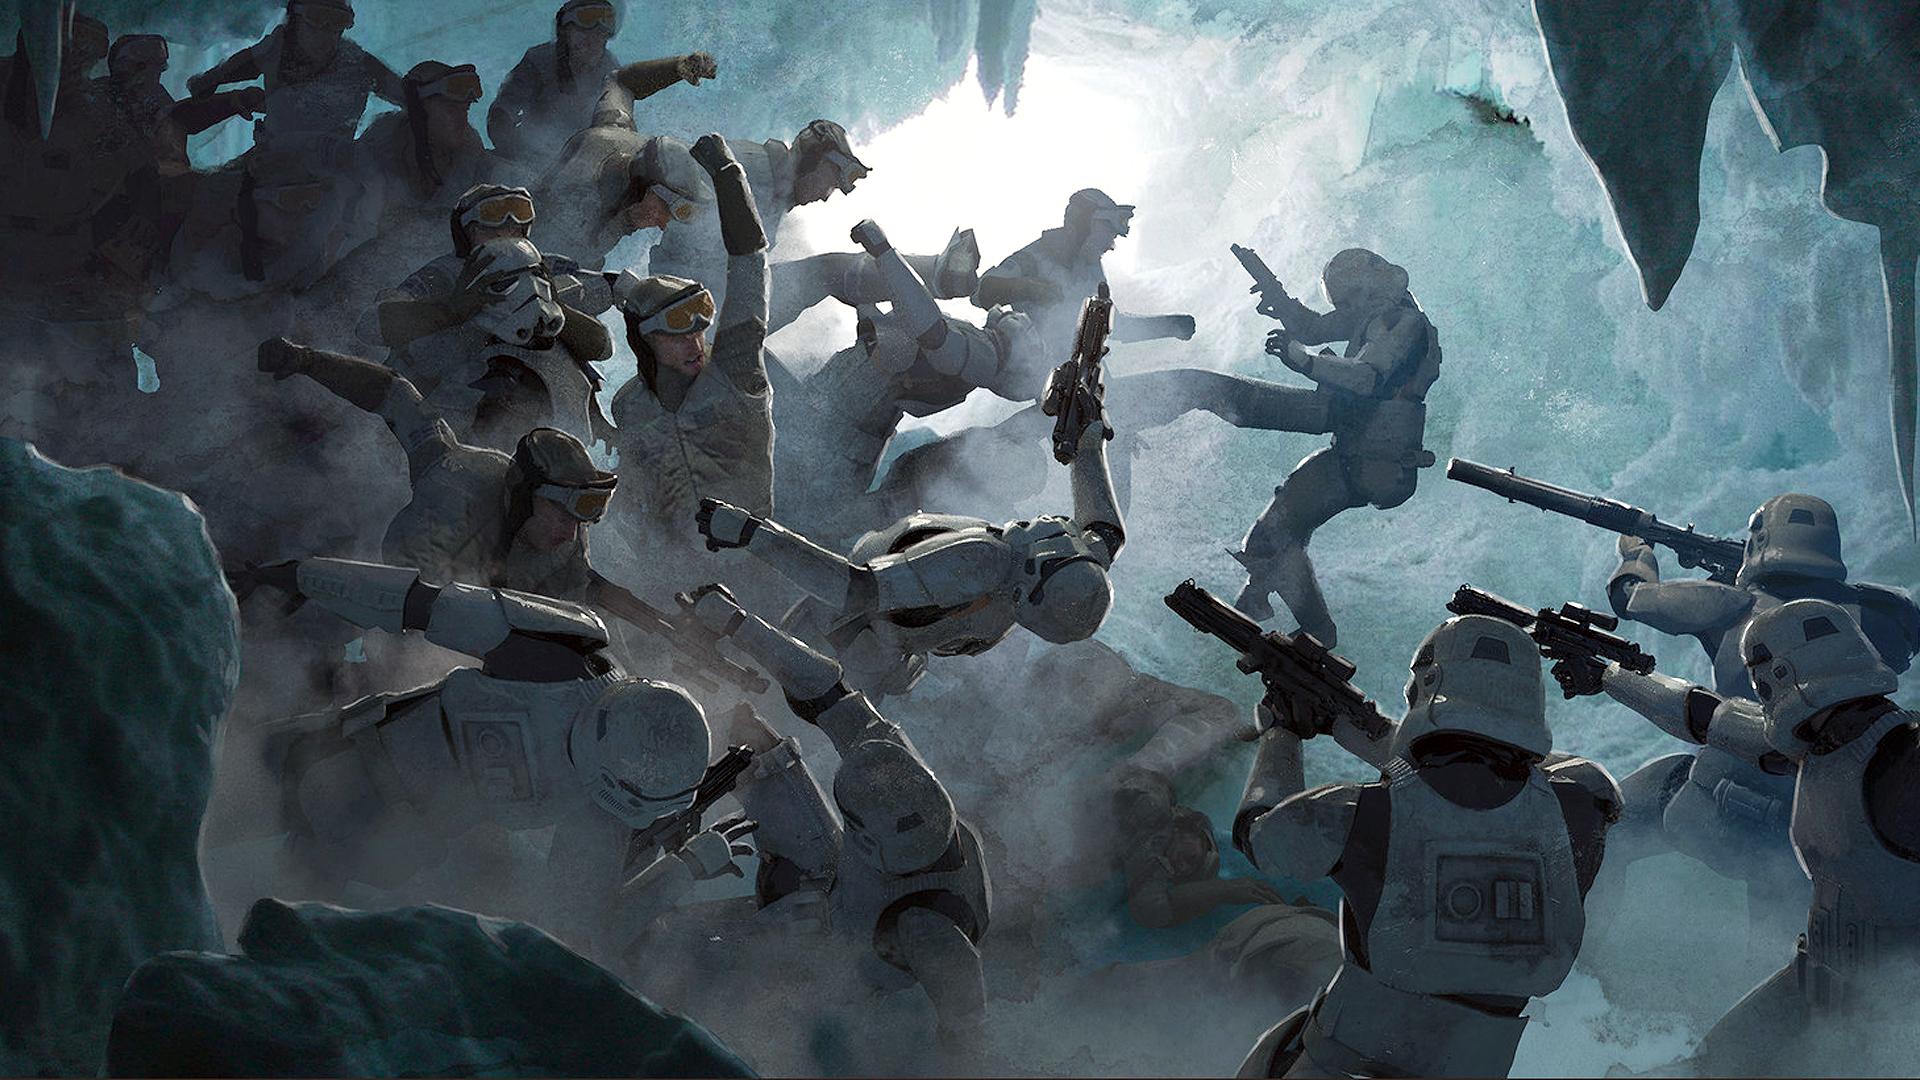 General 1920x1080 Guillem H. Pongiluppi digital art artwork Star Wars stormtrooper Rebels battle ice cave kick blaster movie characters science fiction